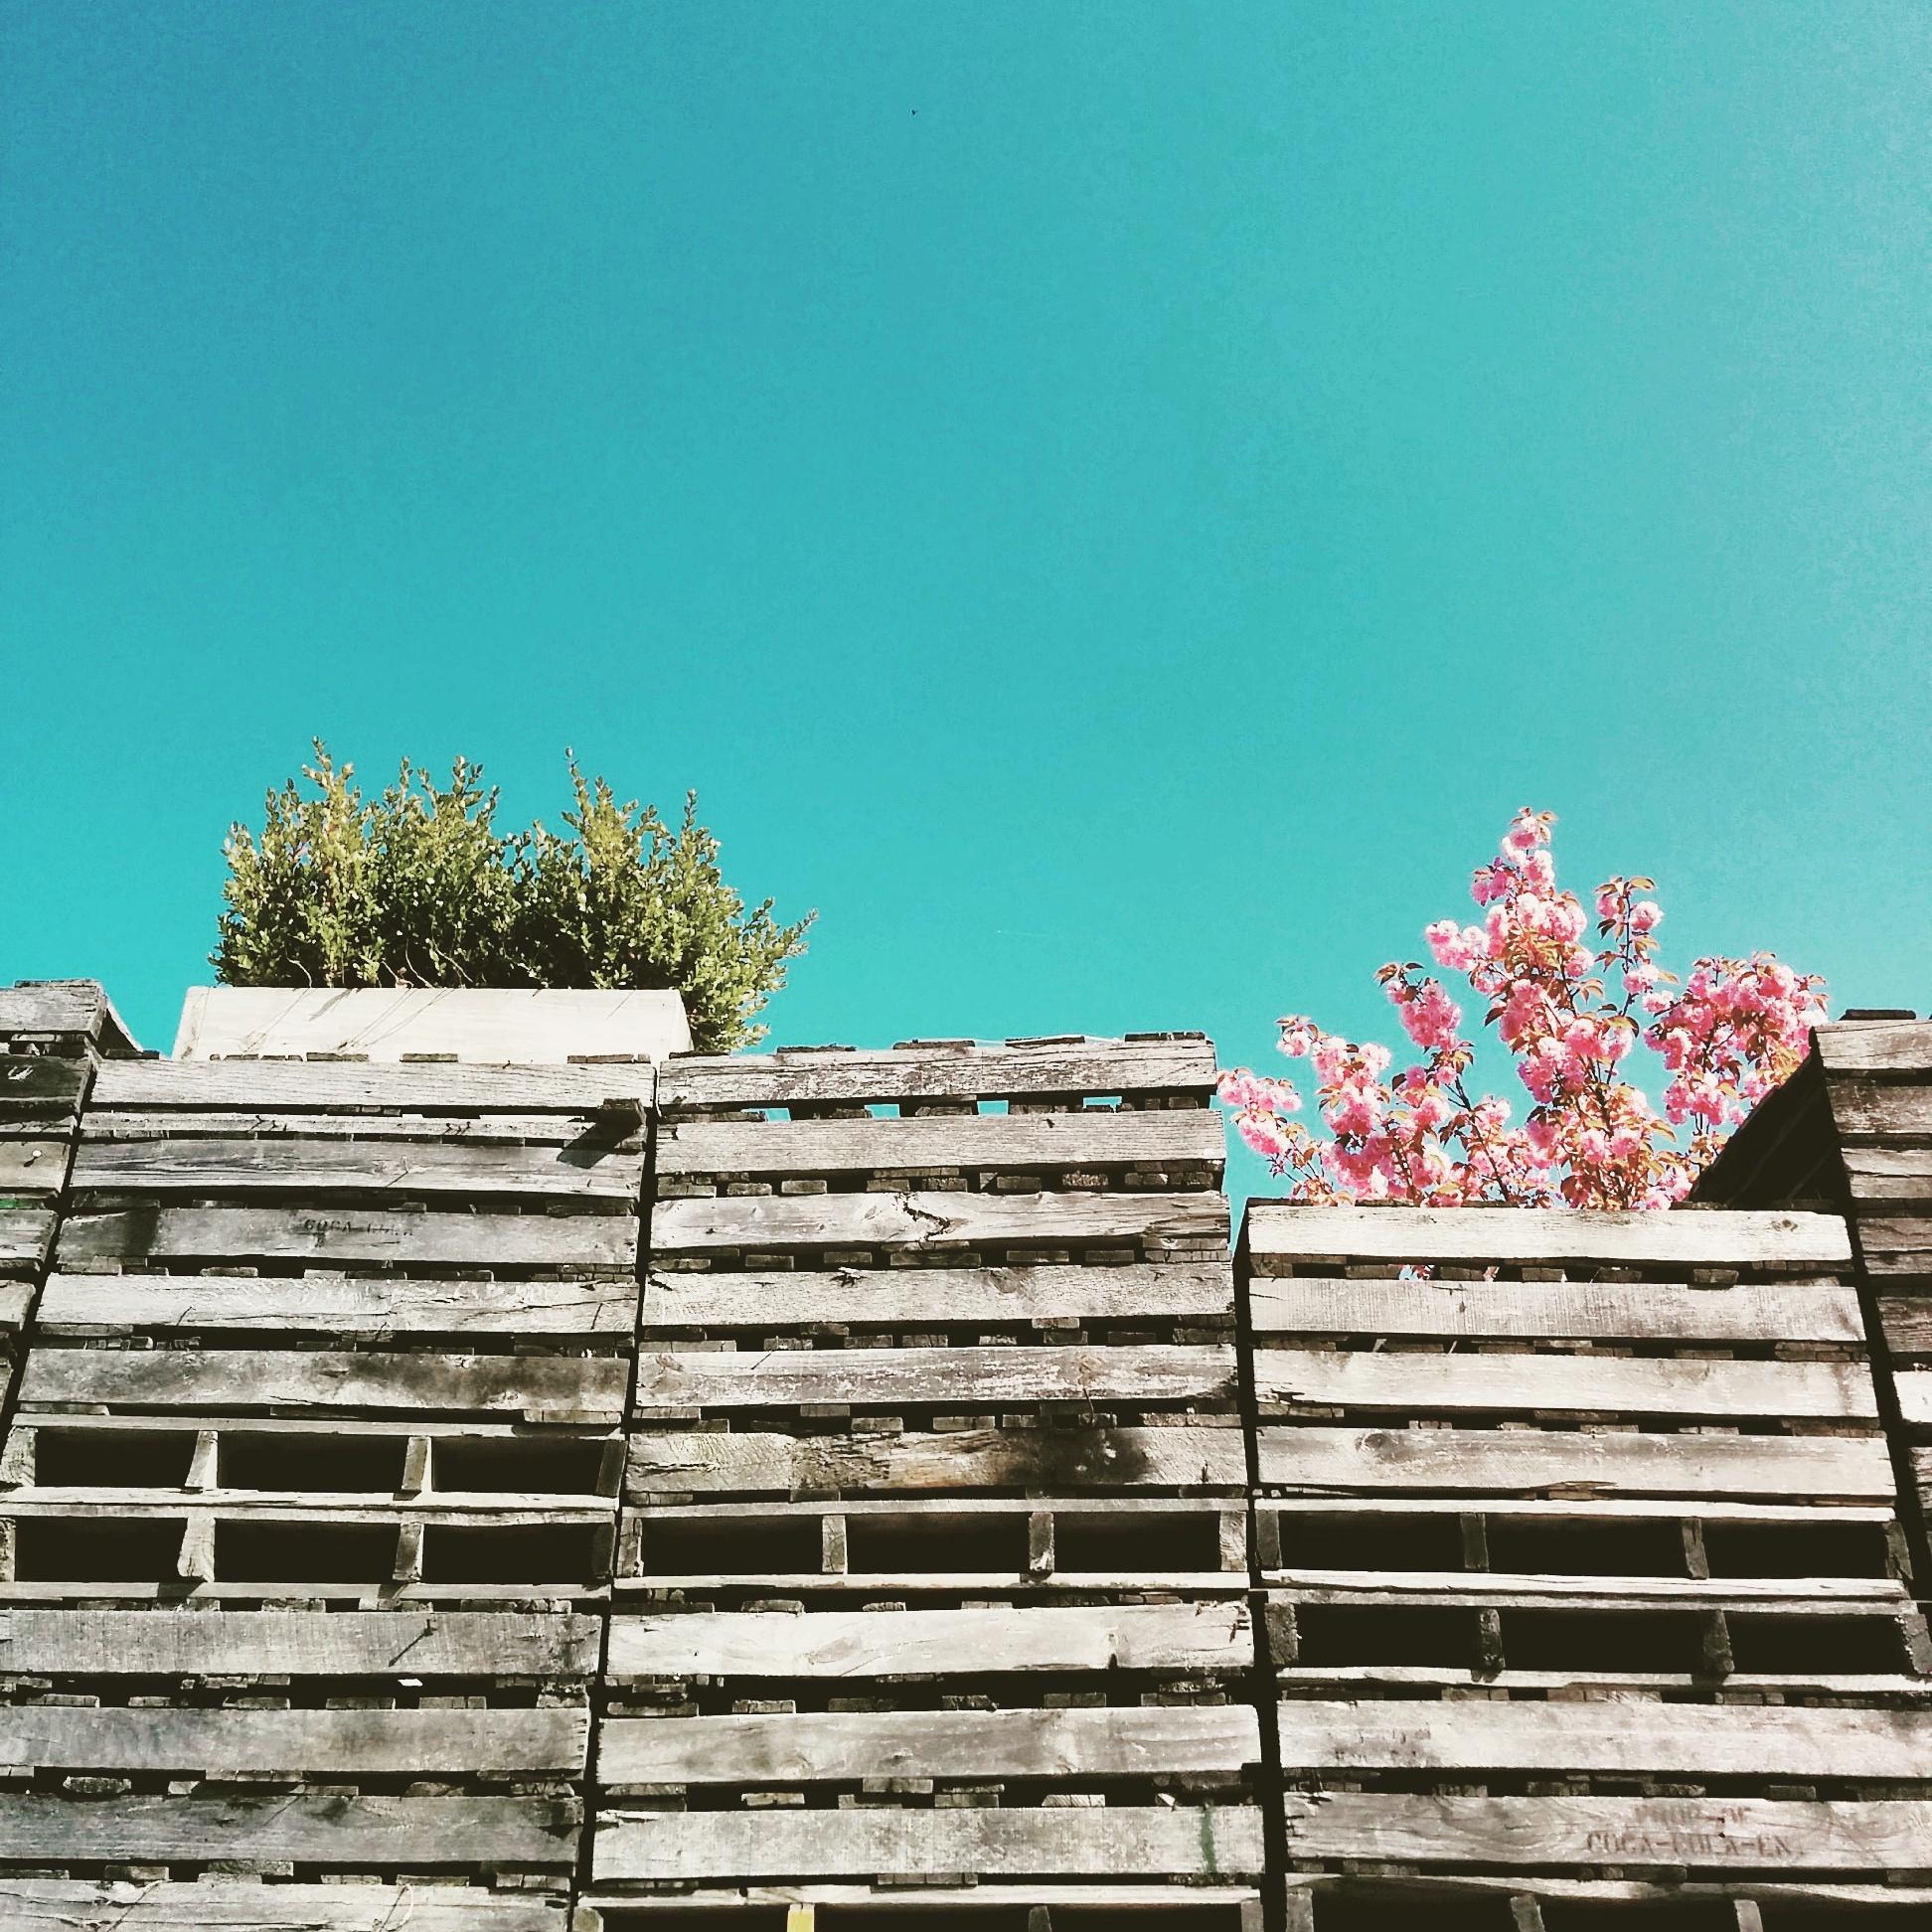 LENS DRIFT PHOTOGRAPHY      |      JUSTINE BETH KAY